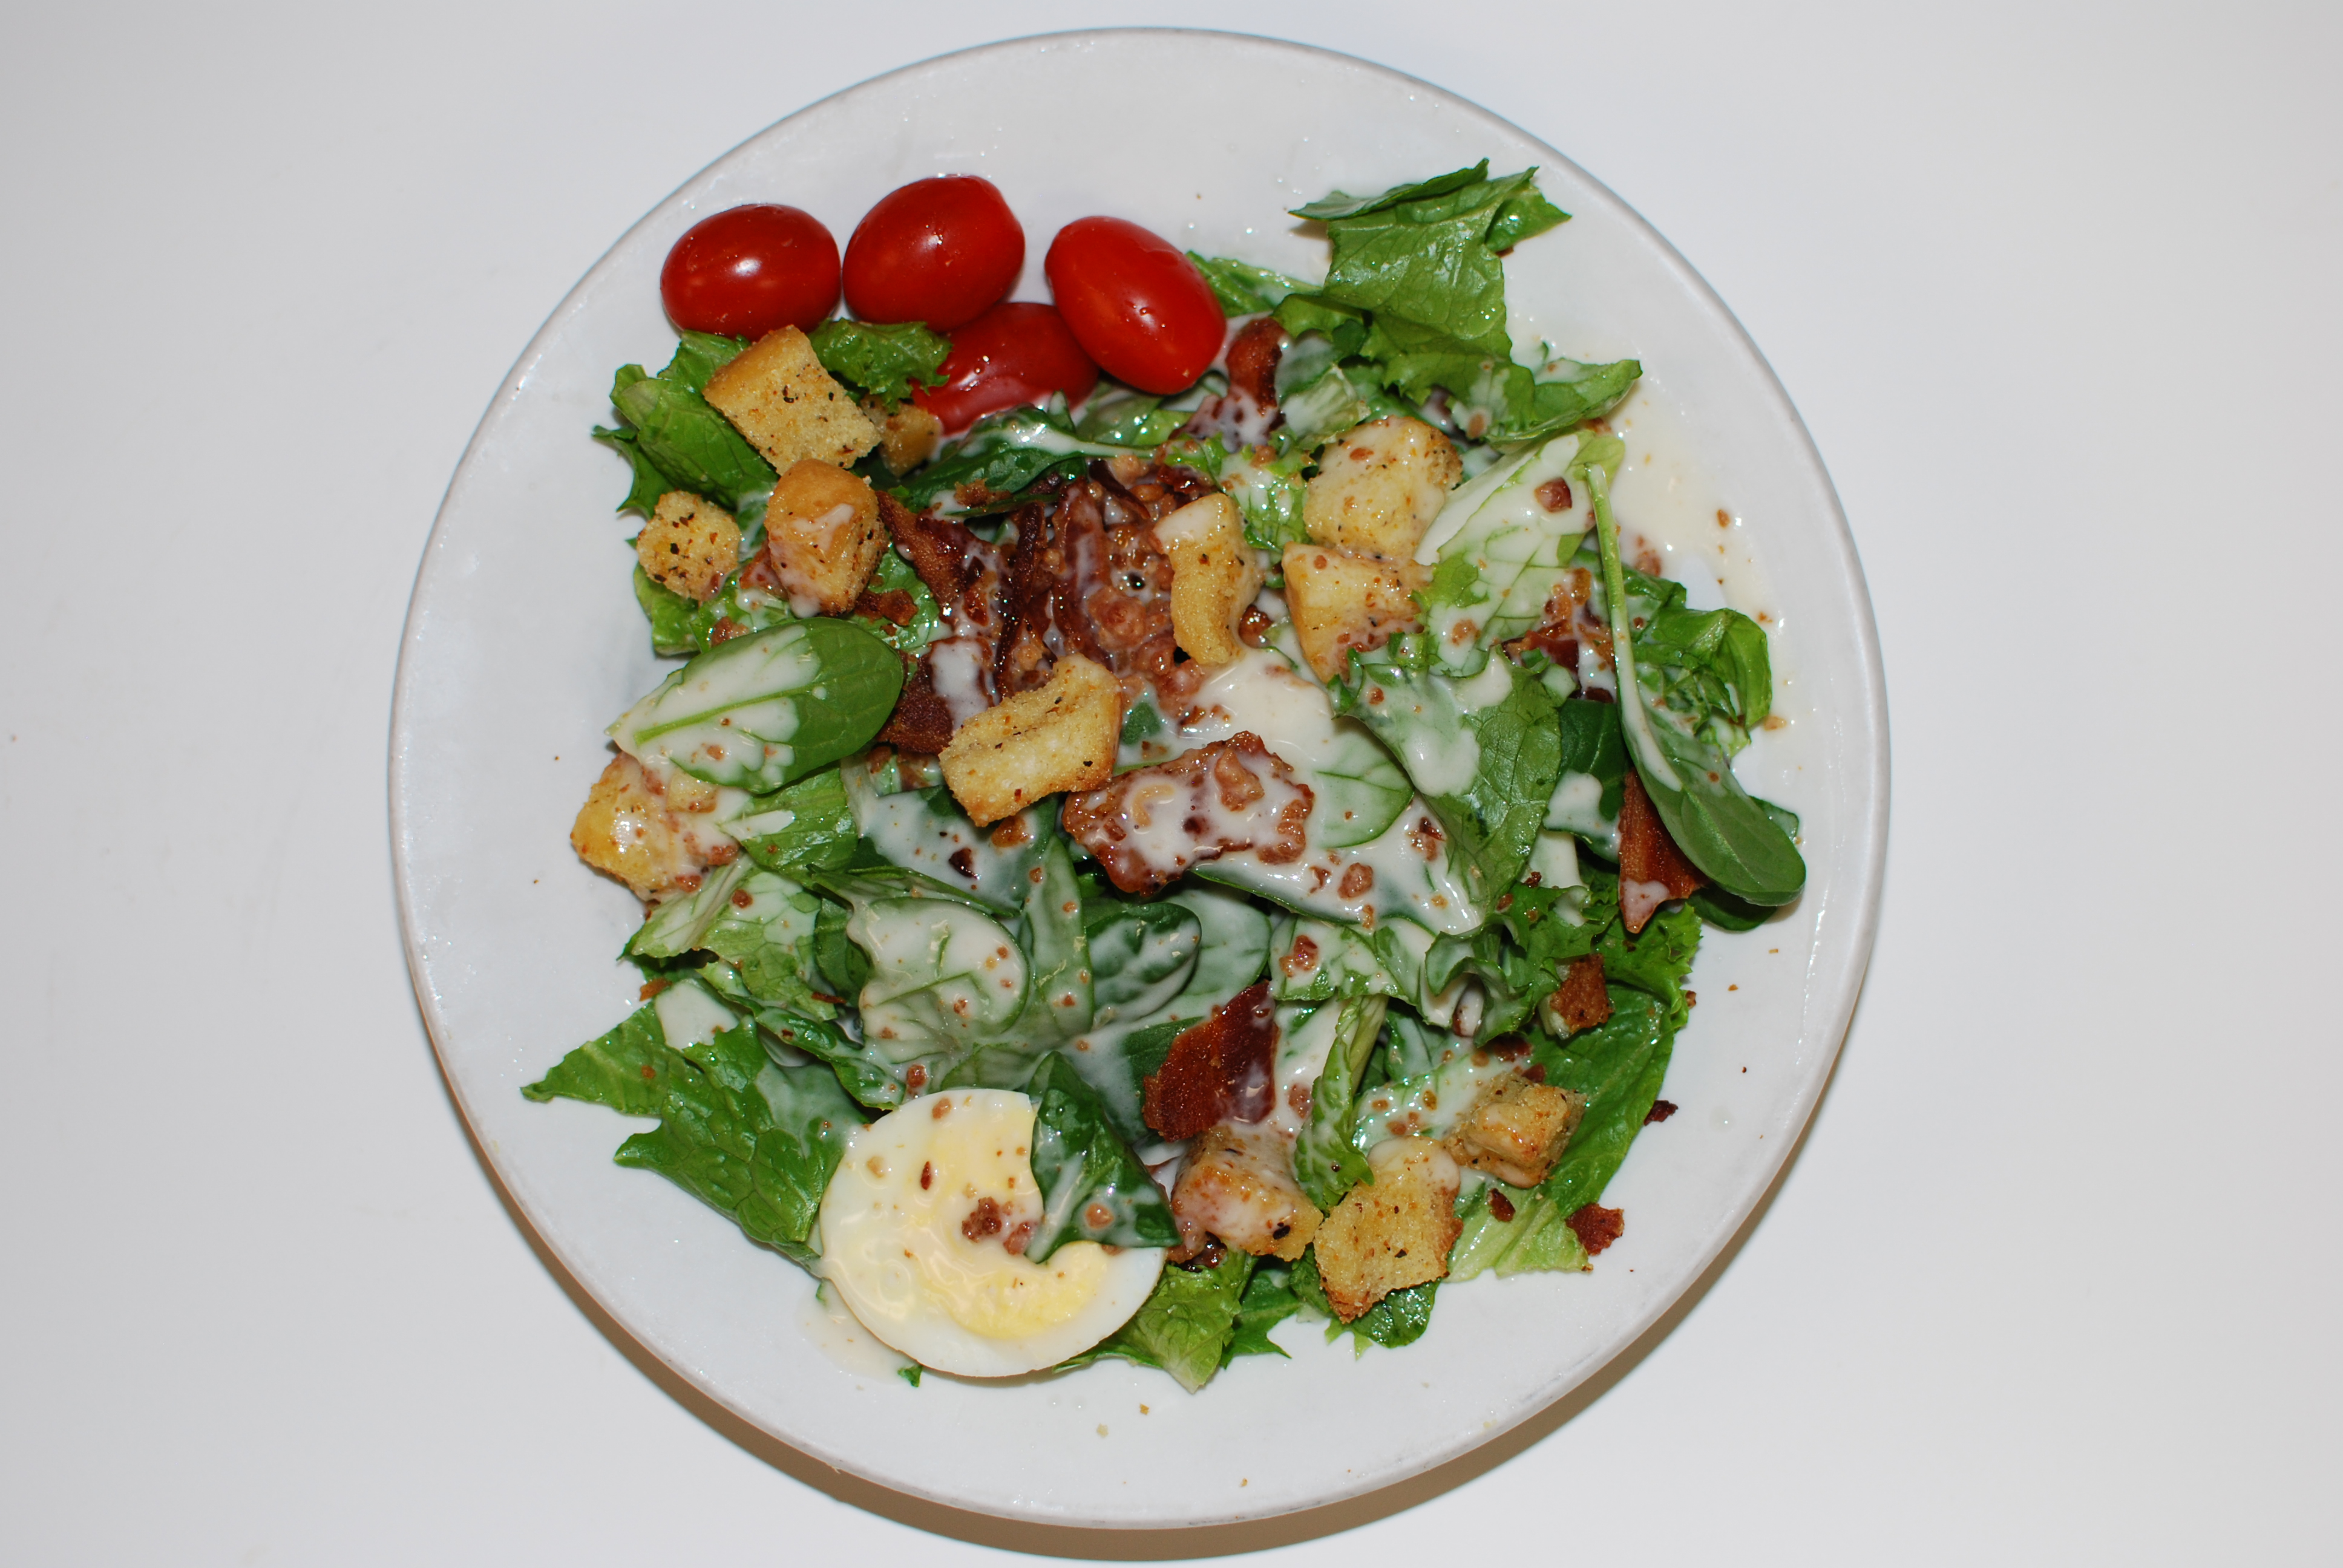 Dinner House Salad $6.00